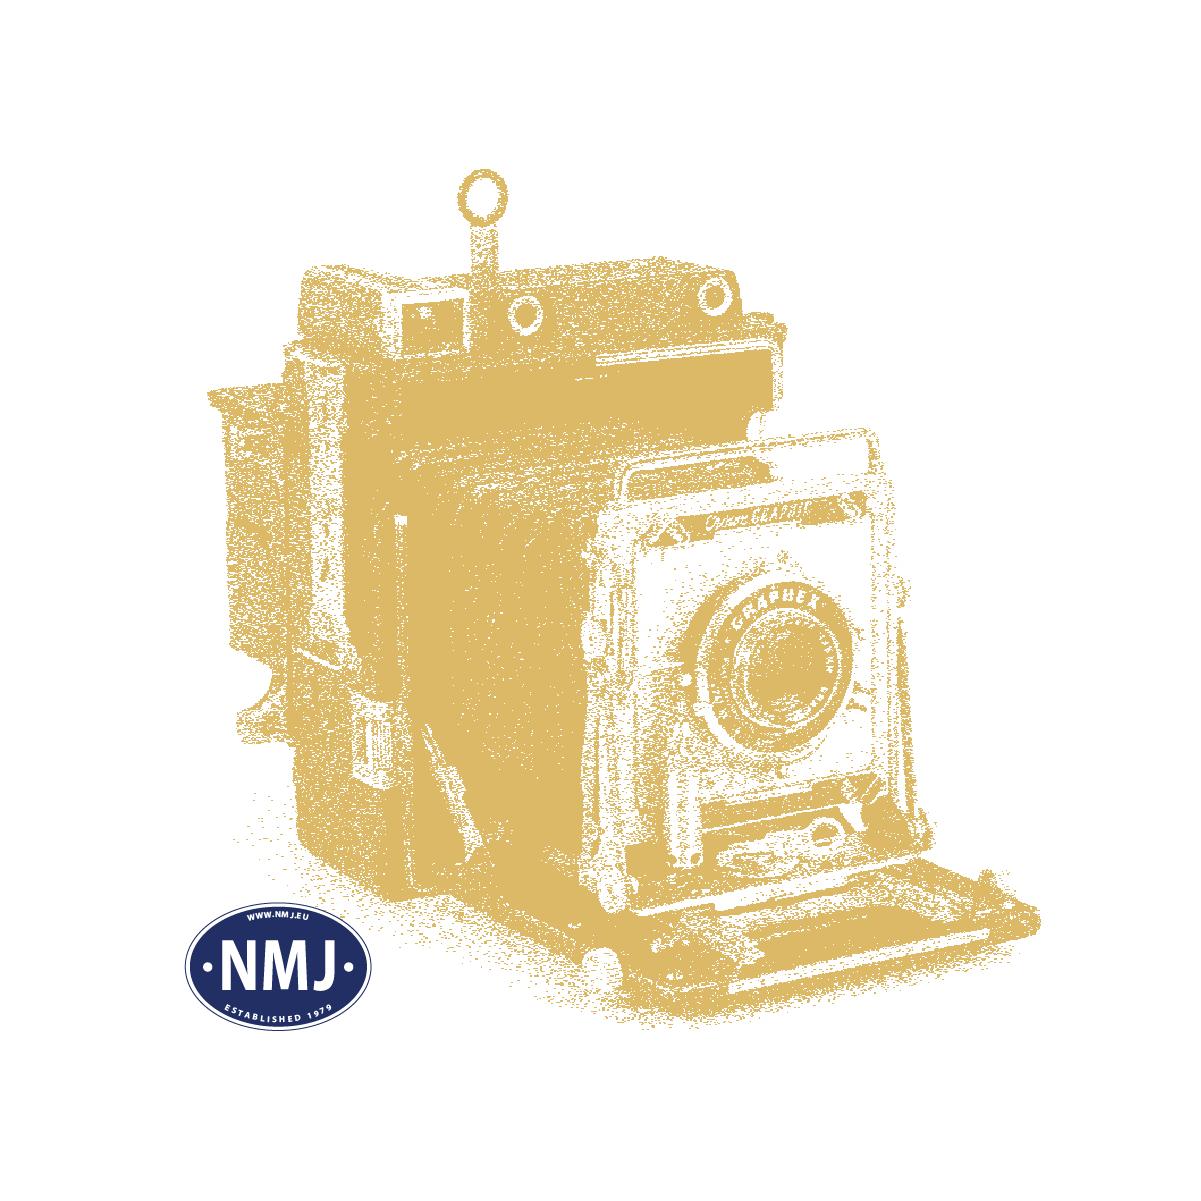 NMJST310543 - NMJ Superline NSB T3 10543 Stakevogn m/ Bremseplattform, *NMJ 40 ÅR*